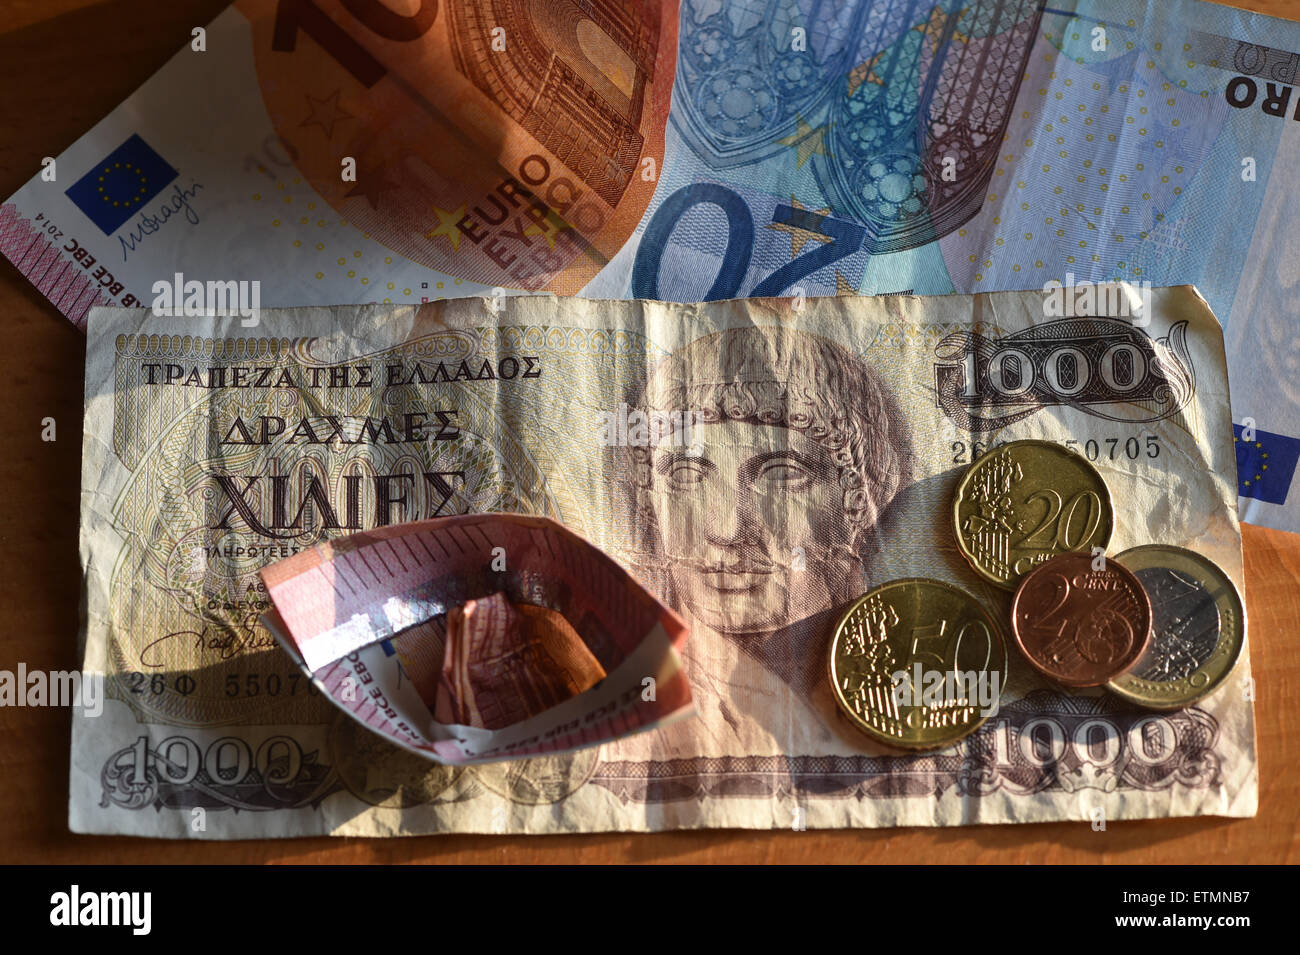 Berlin, Germany. 14th June, 2015. ILLUSTRATION - Euro coins, euro bills and a 1000 Greek drachma bill are seen in Berlin, Germany, 14 June 2015. Photo: Jens Kalaene/dpa/Alamy Live News Stock Photo